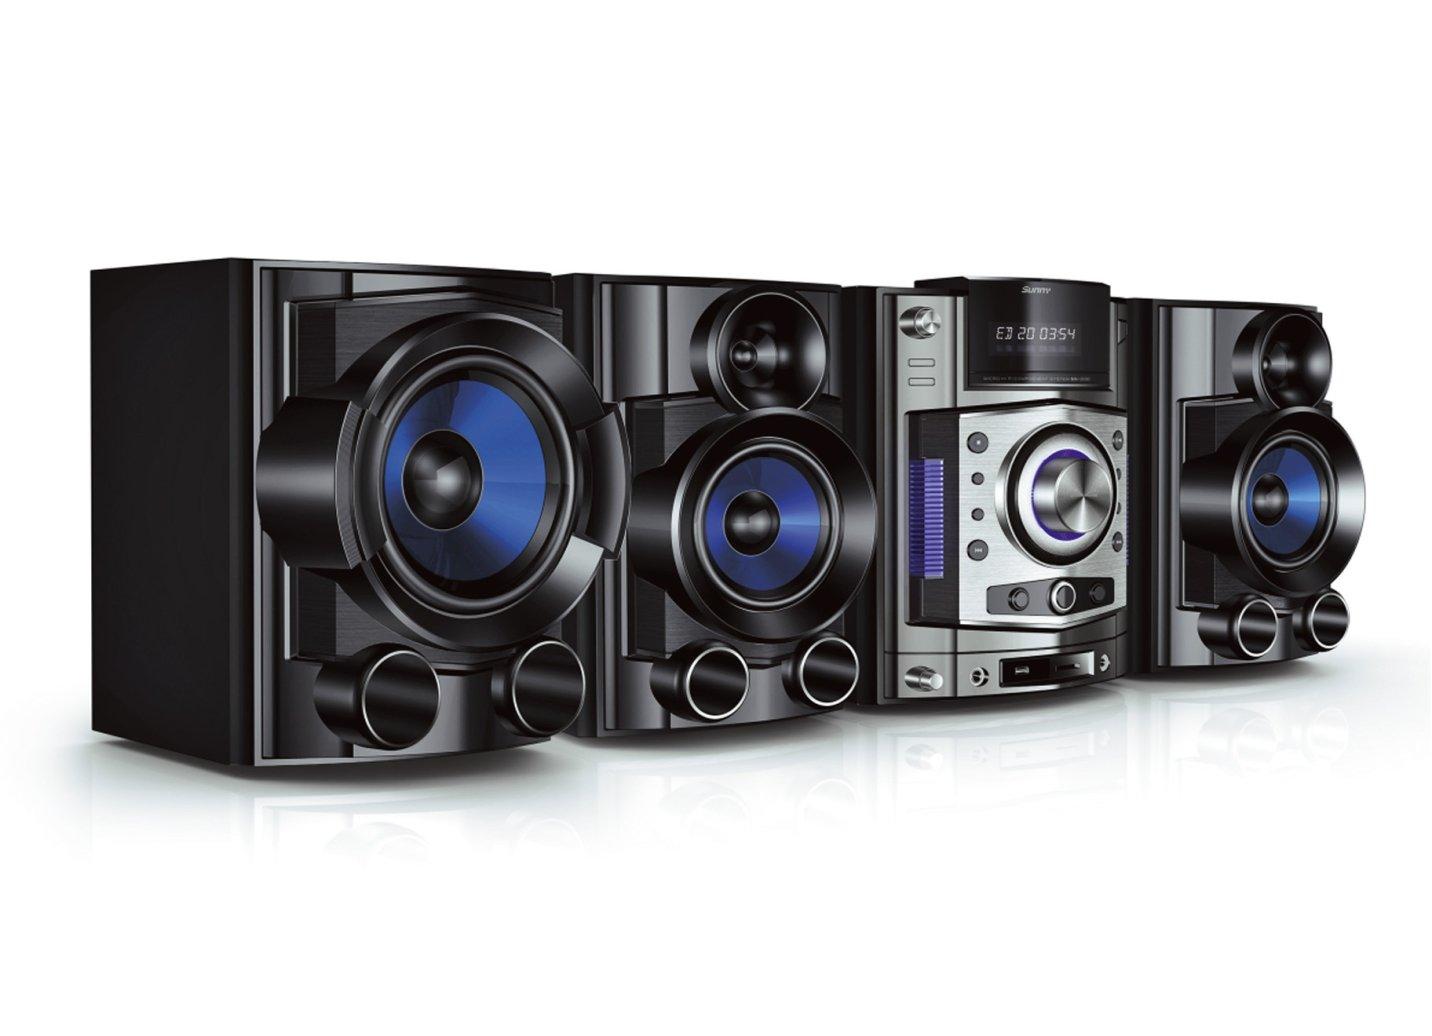 hifi system stereoanlage 400w cd dvd mp3 musikanlage hifi radio audio ds ebay. Black Bedroom Furniture Sets. Home Design Ideas